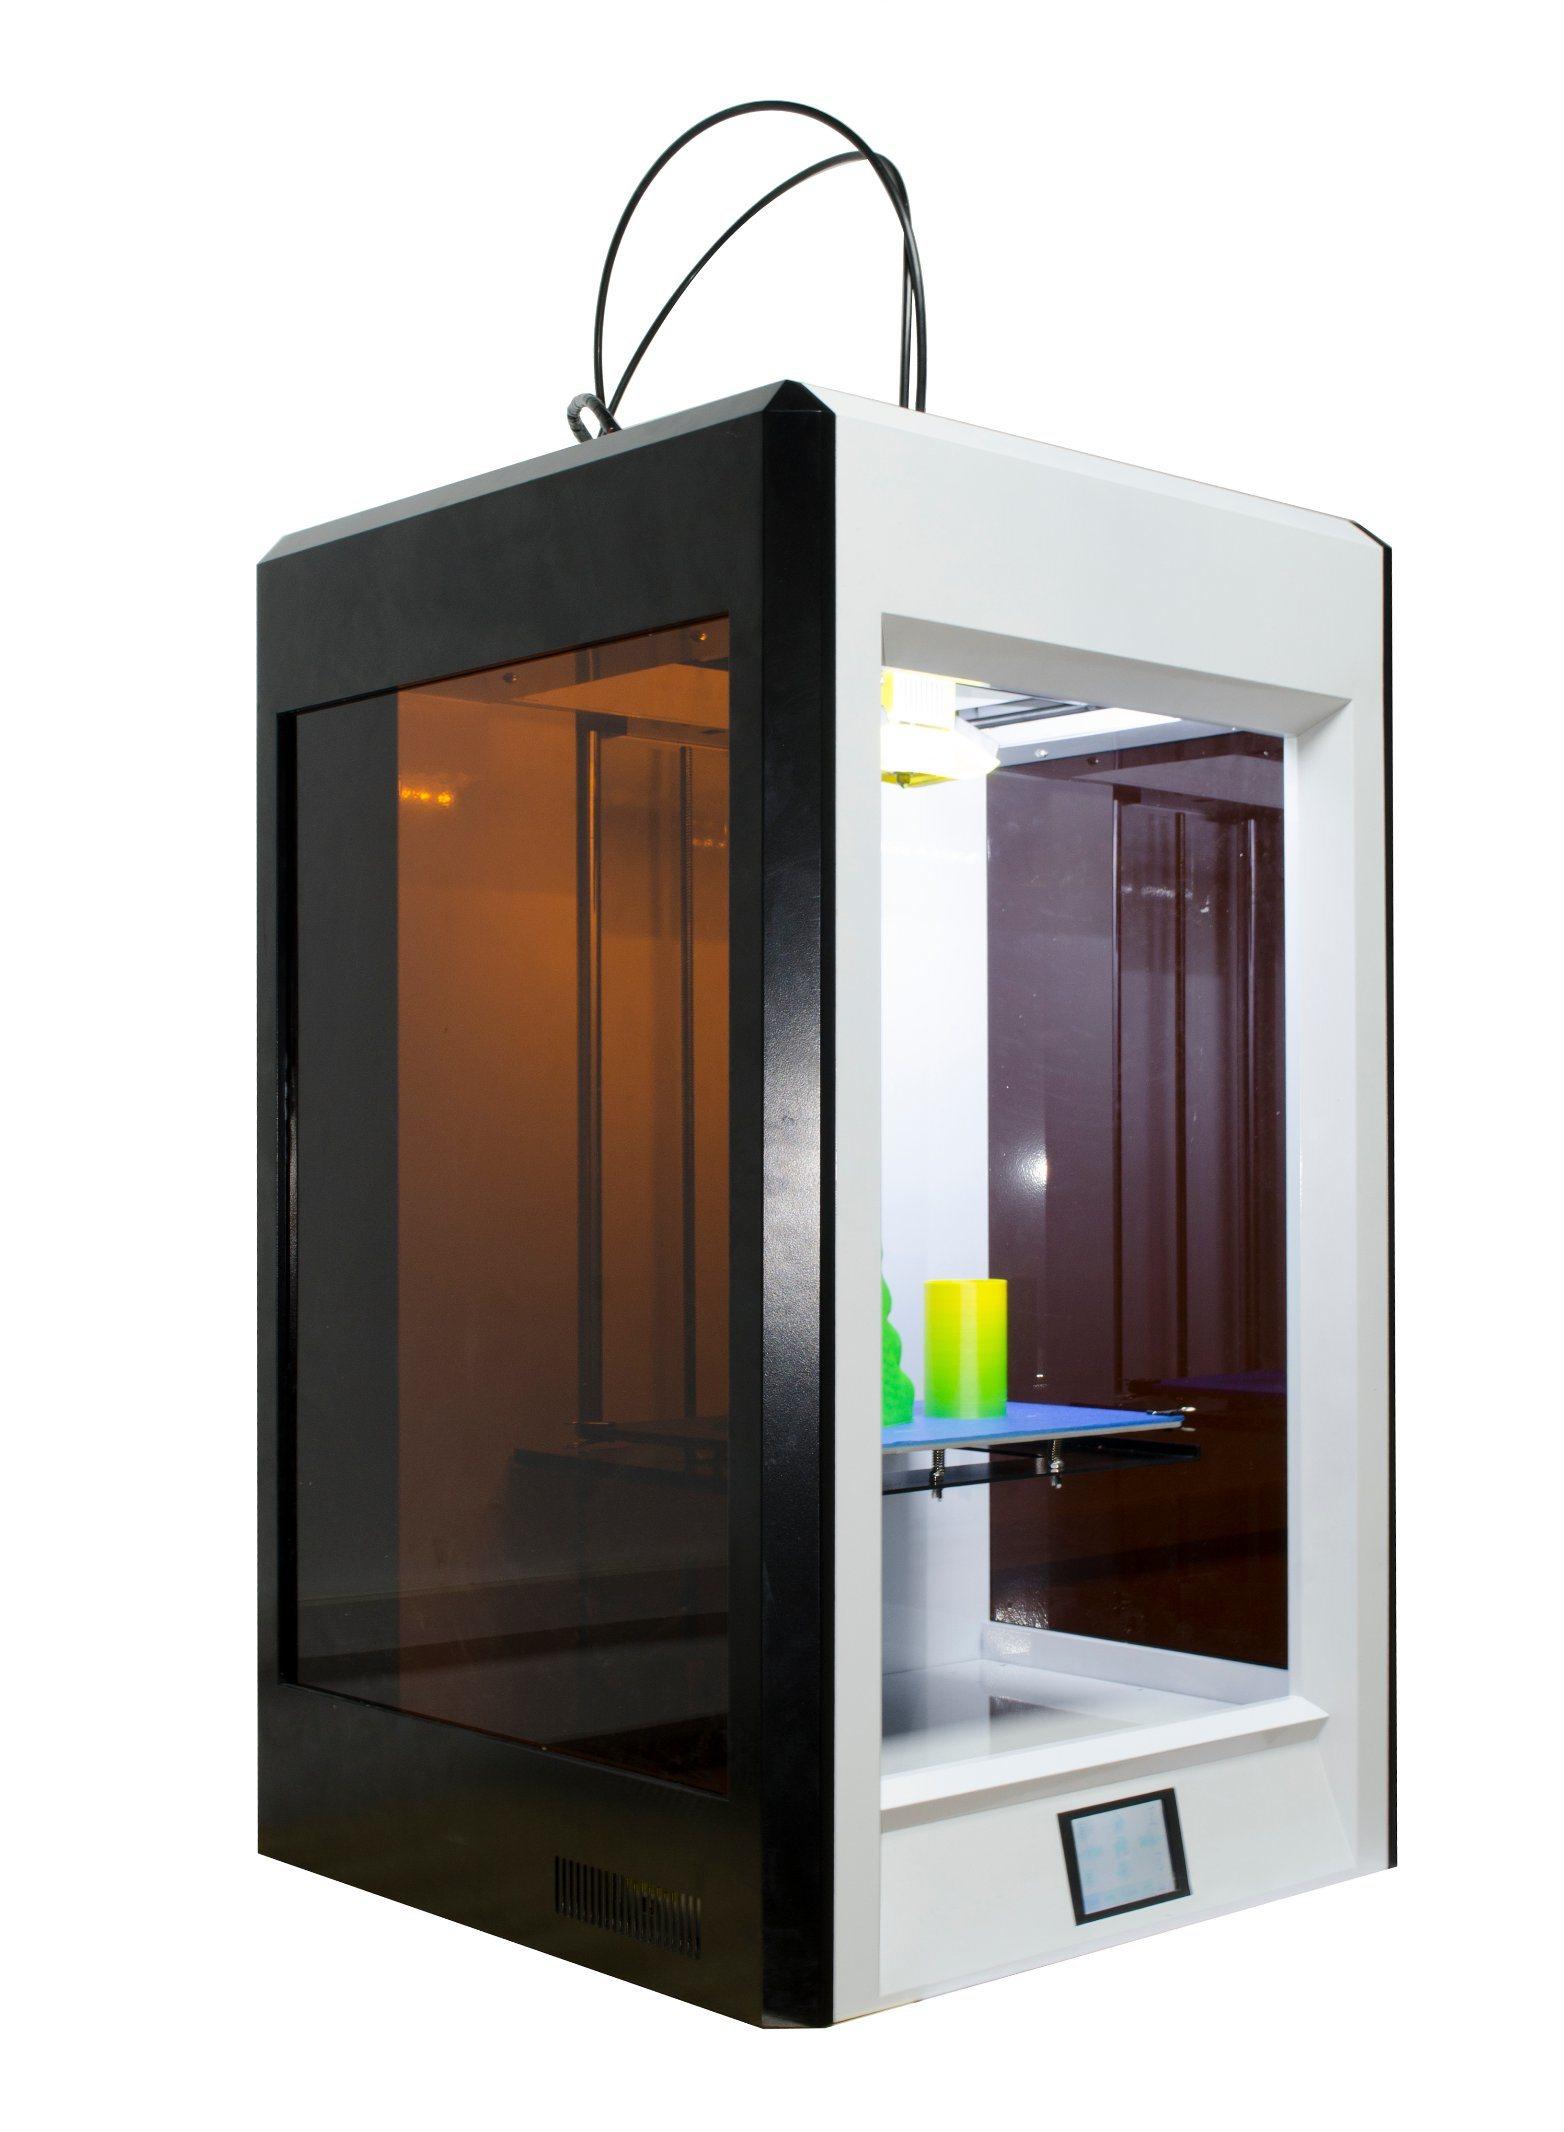 2017 Rasicube New Version Manufacture Rapid Prototype Fdm 3D Printer Machine